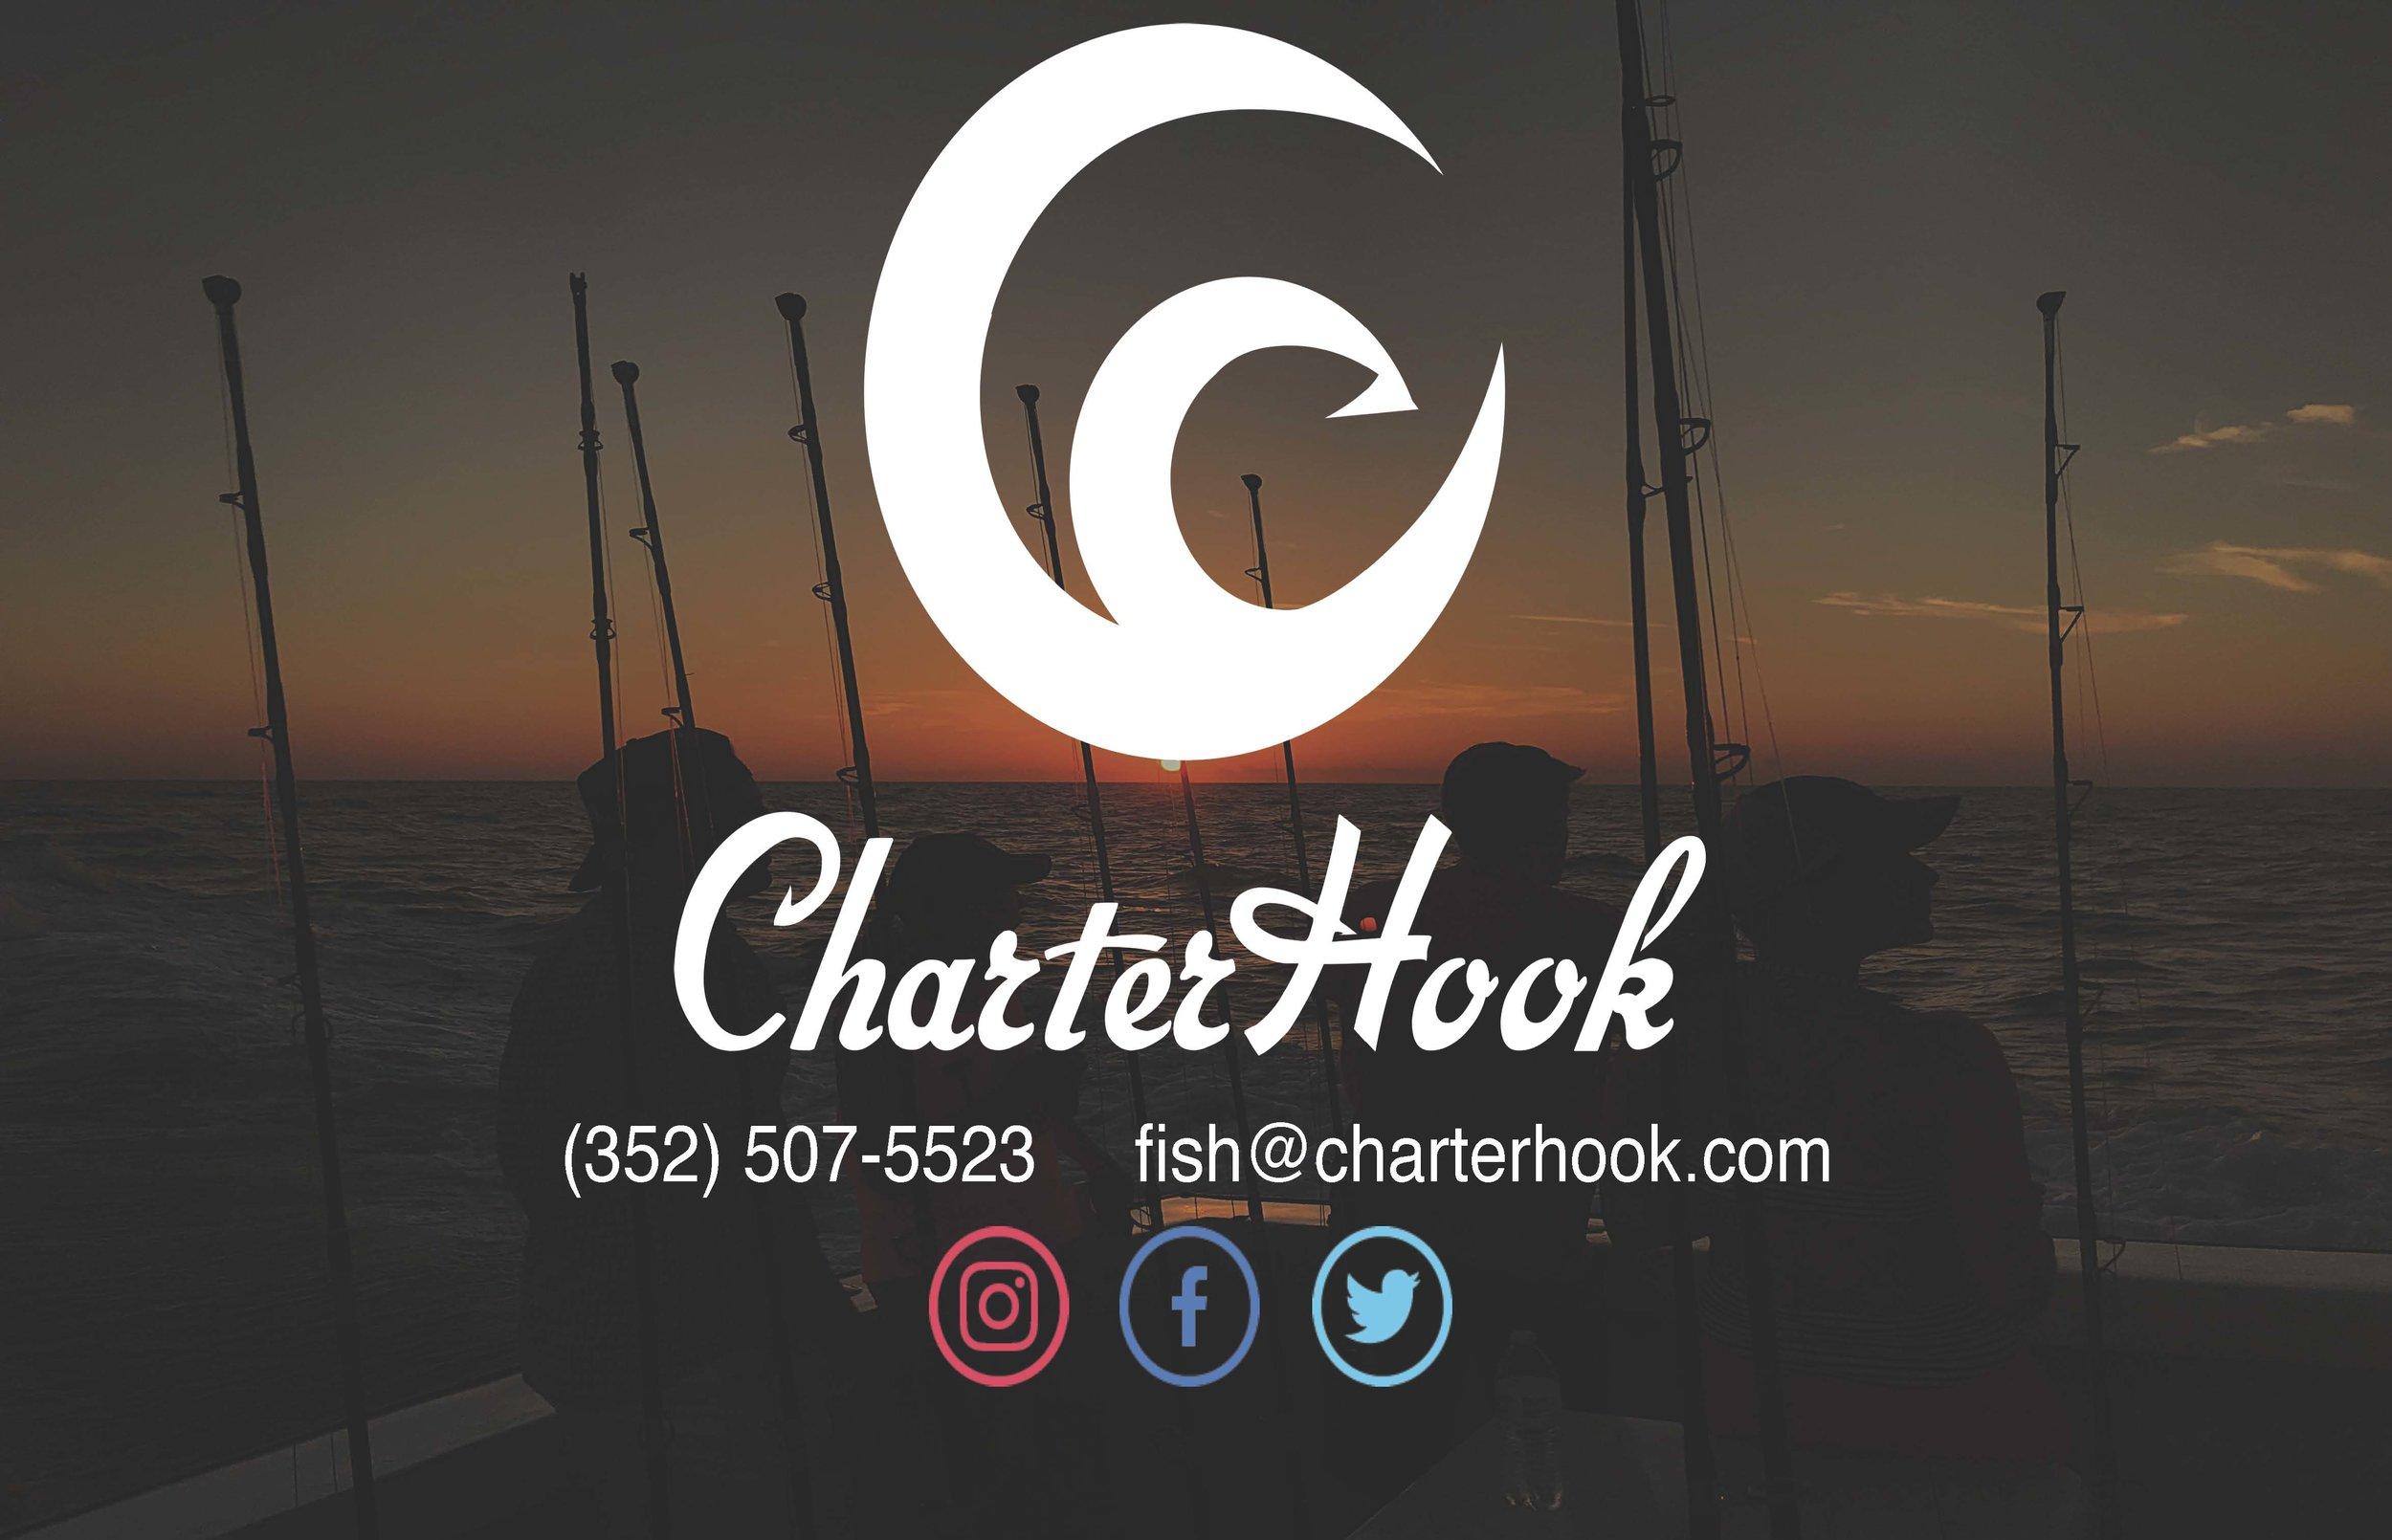 Charterhook_Demo Day Pitch Deck_08162018_Page_13.jpg